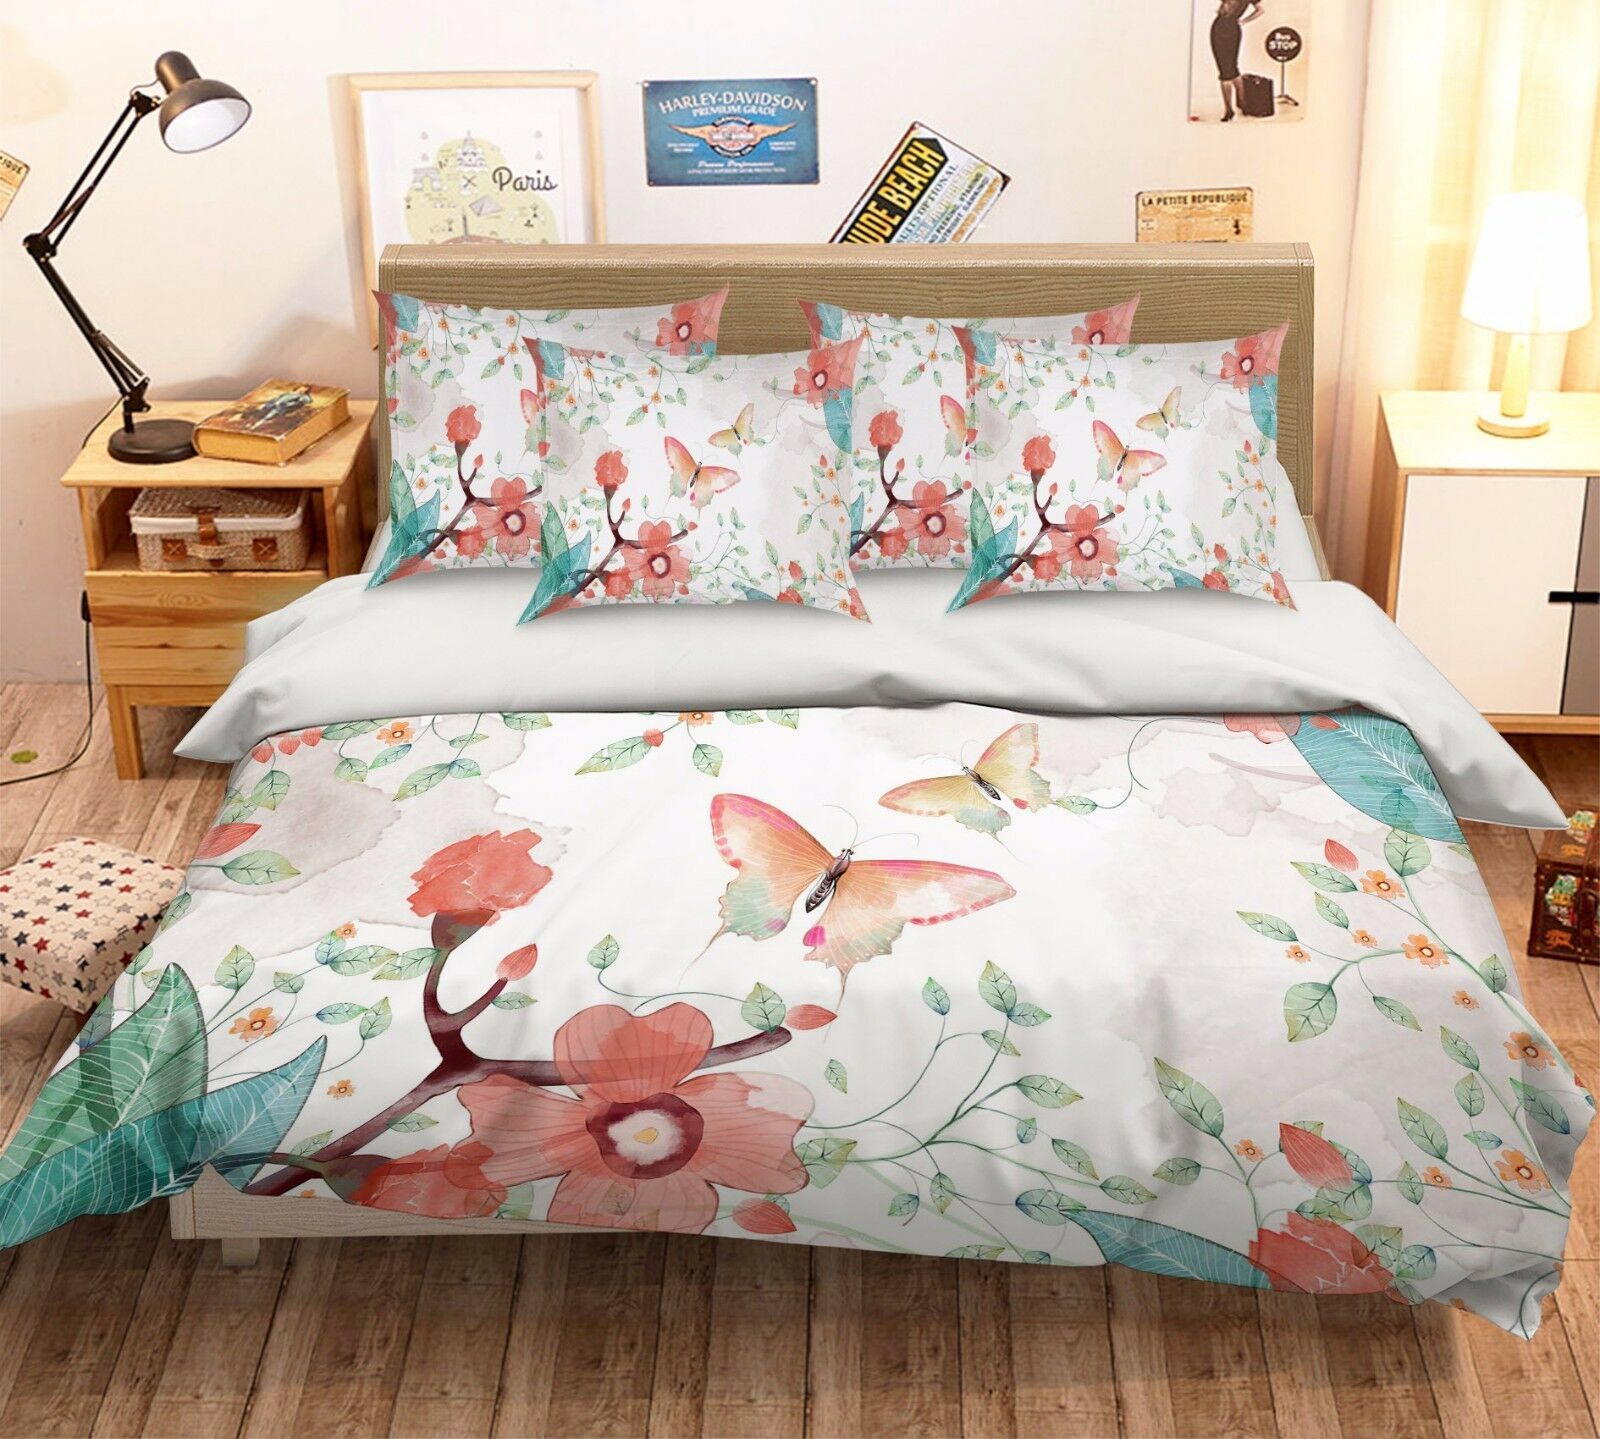 3D Butterfly 209 Bed Pillowcases Quilt Duvet Cover Set Single Queen King Größe AU